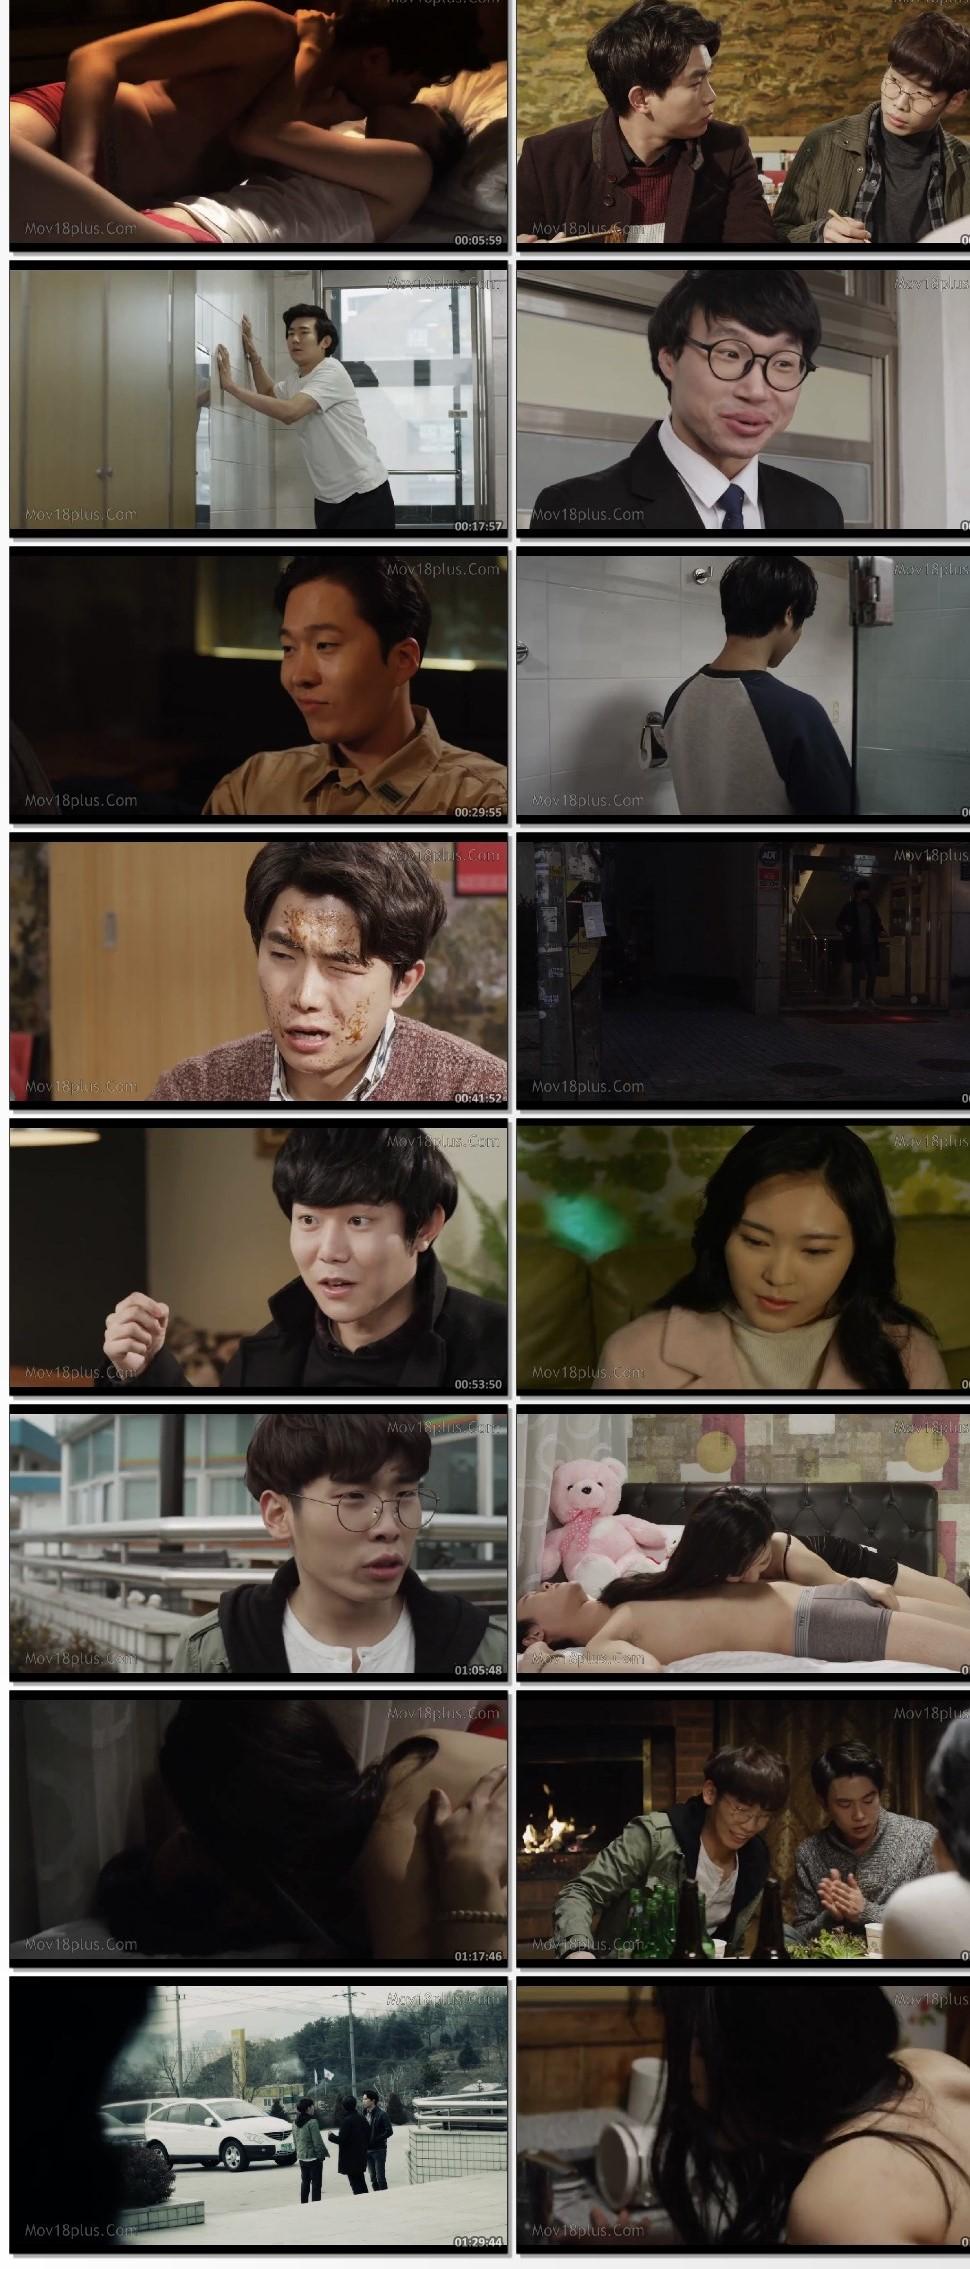 The-Night-Before-Enlistment-Unedited-2021-www-filmguro-site-Korean-Movie-720p-HDRip-970-MB-mkv-thumb